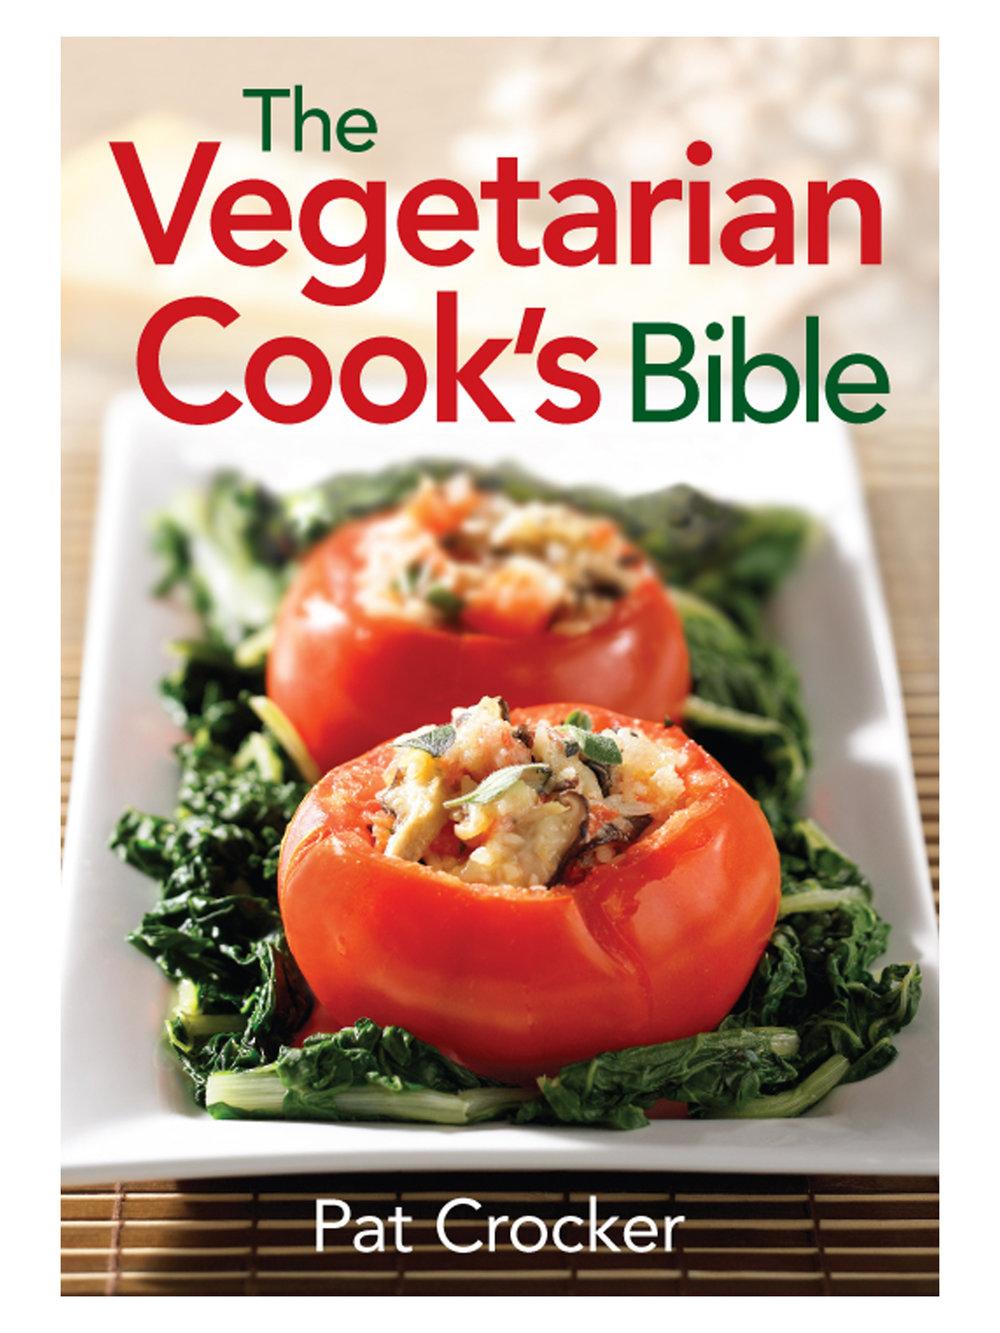 The Vegetarian Cook's Bible